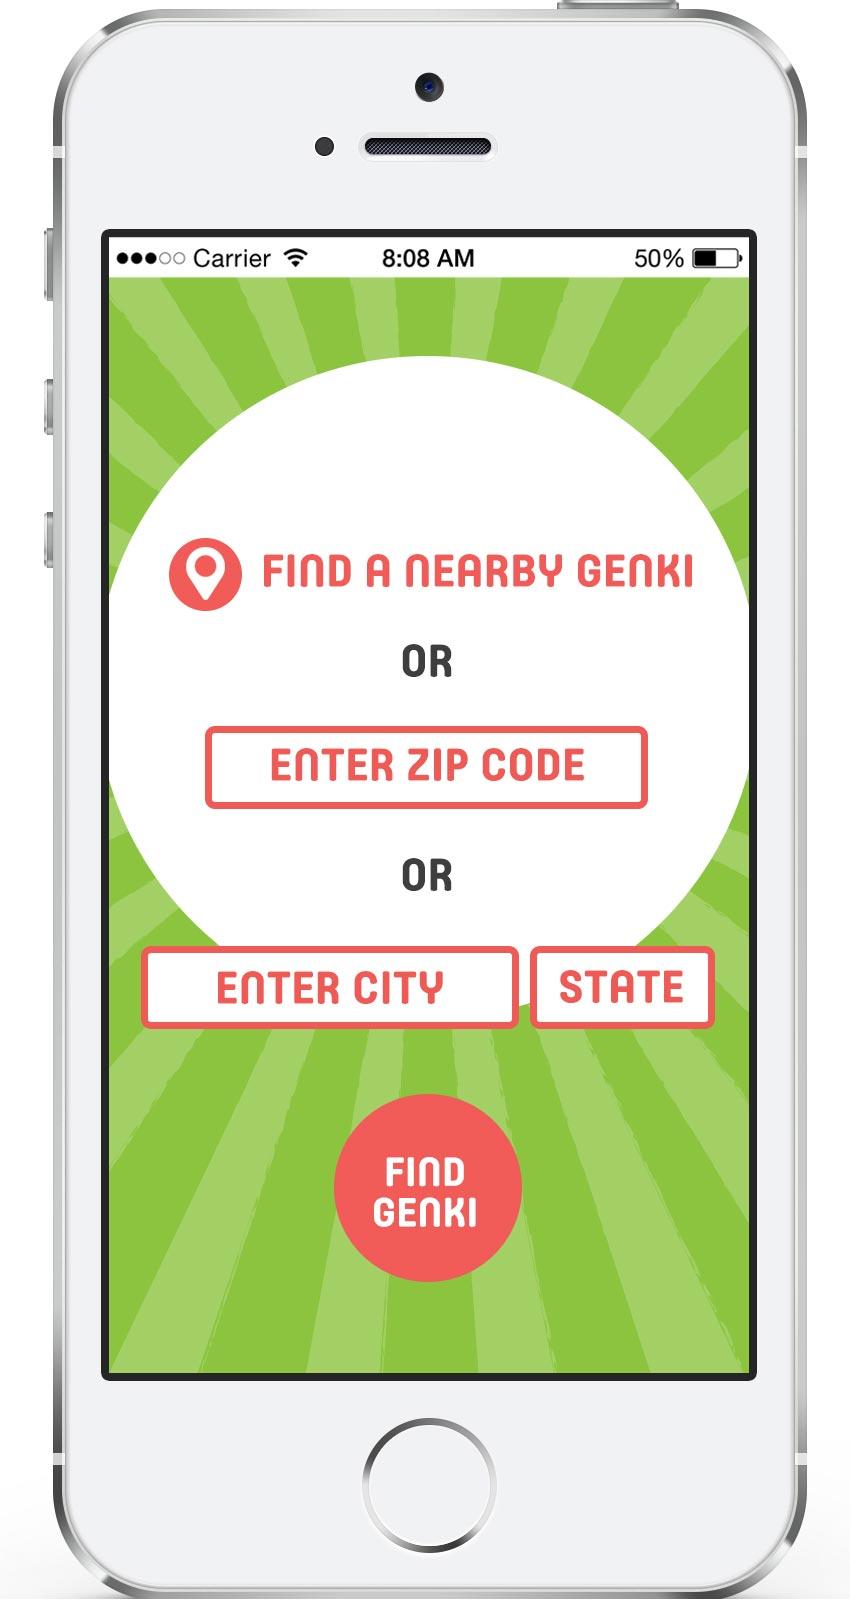 genki-phone-app-2